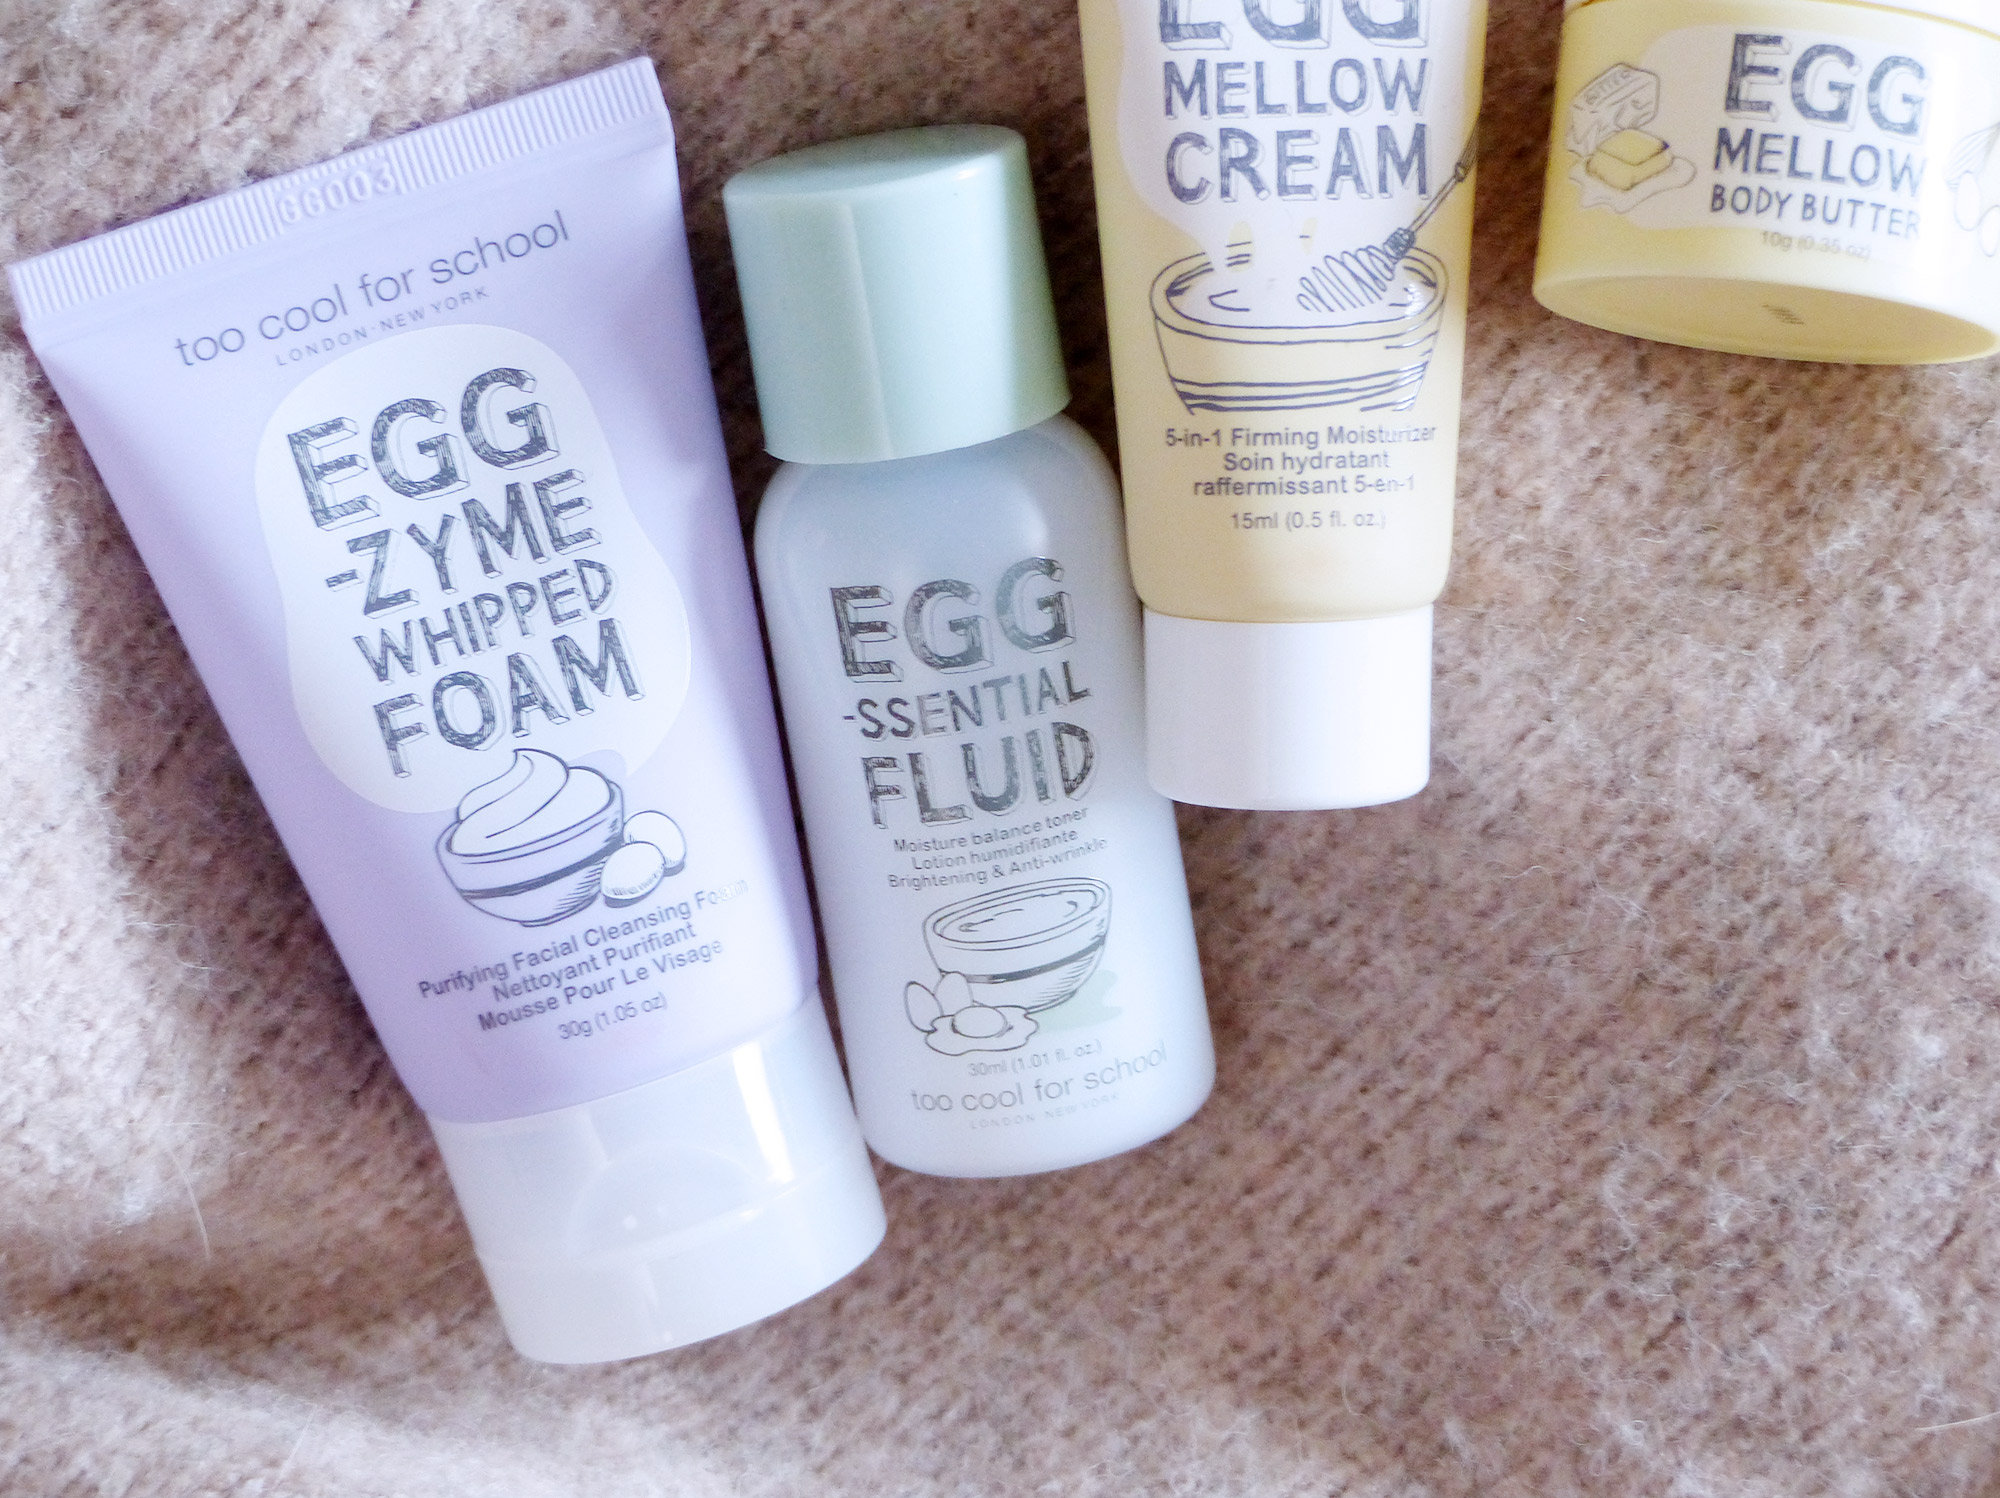 Too Cool For School Egg Essentiel Fluid - Autour de Marine